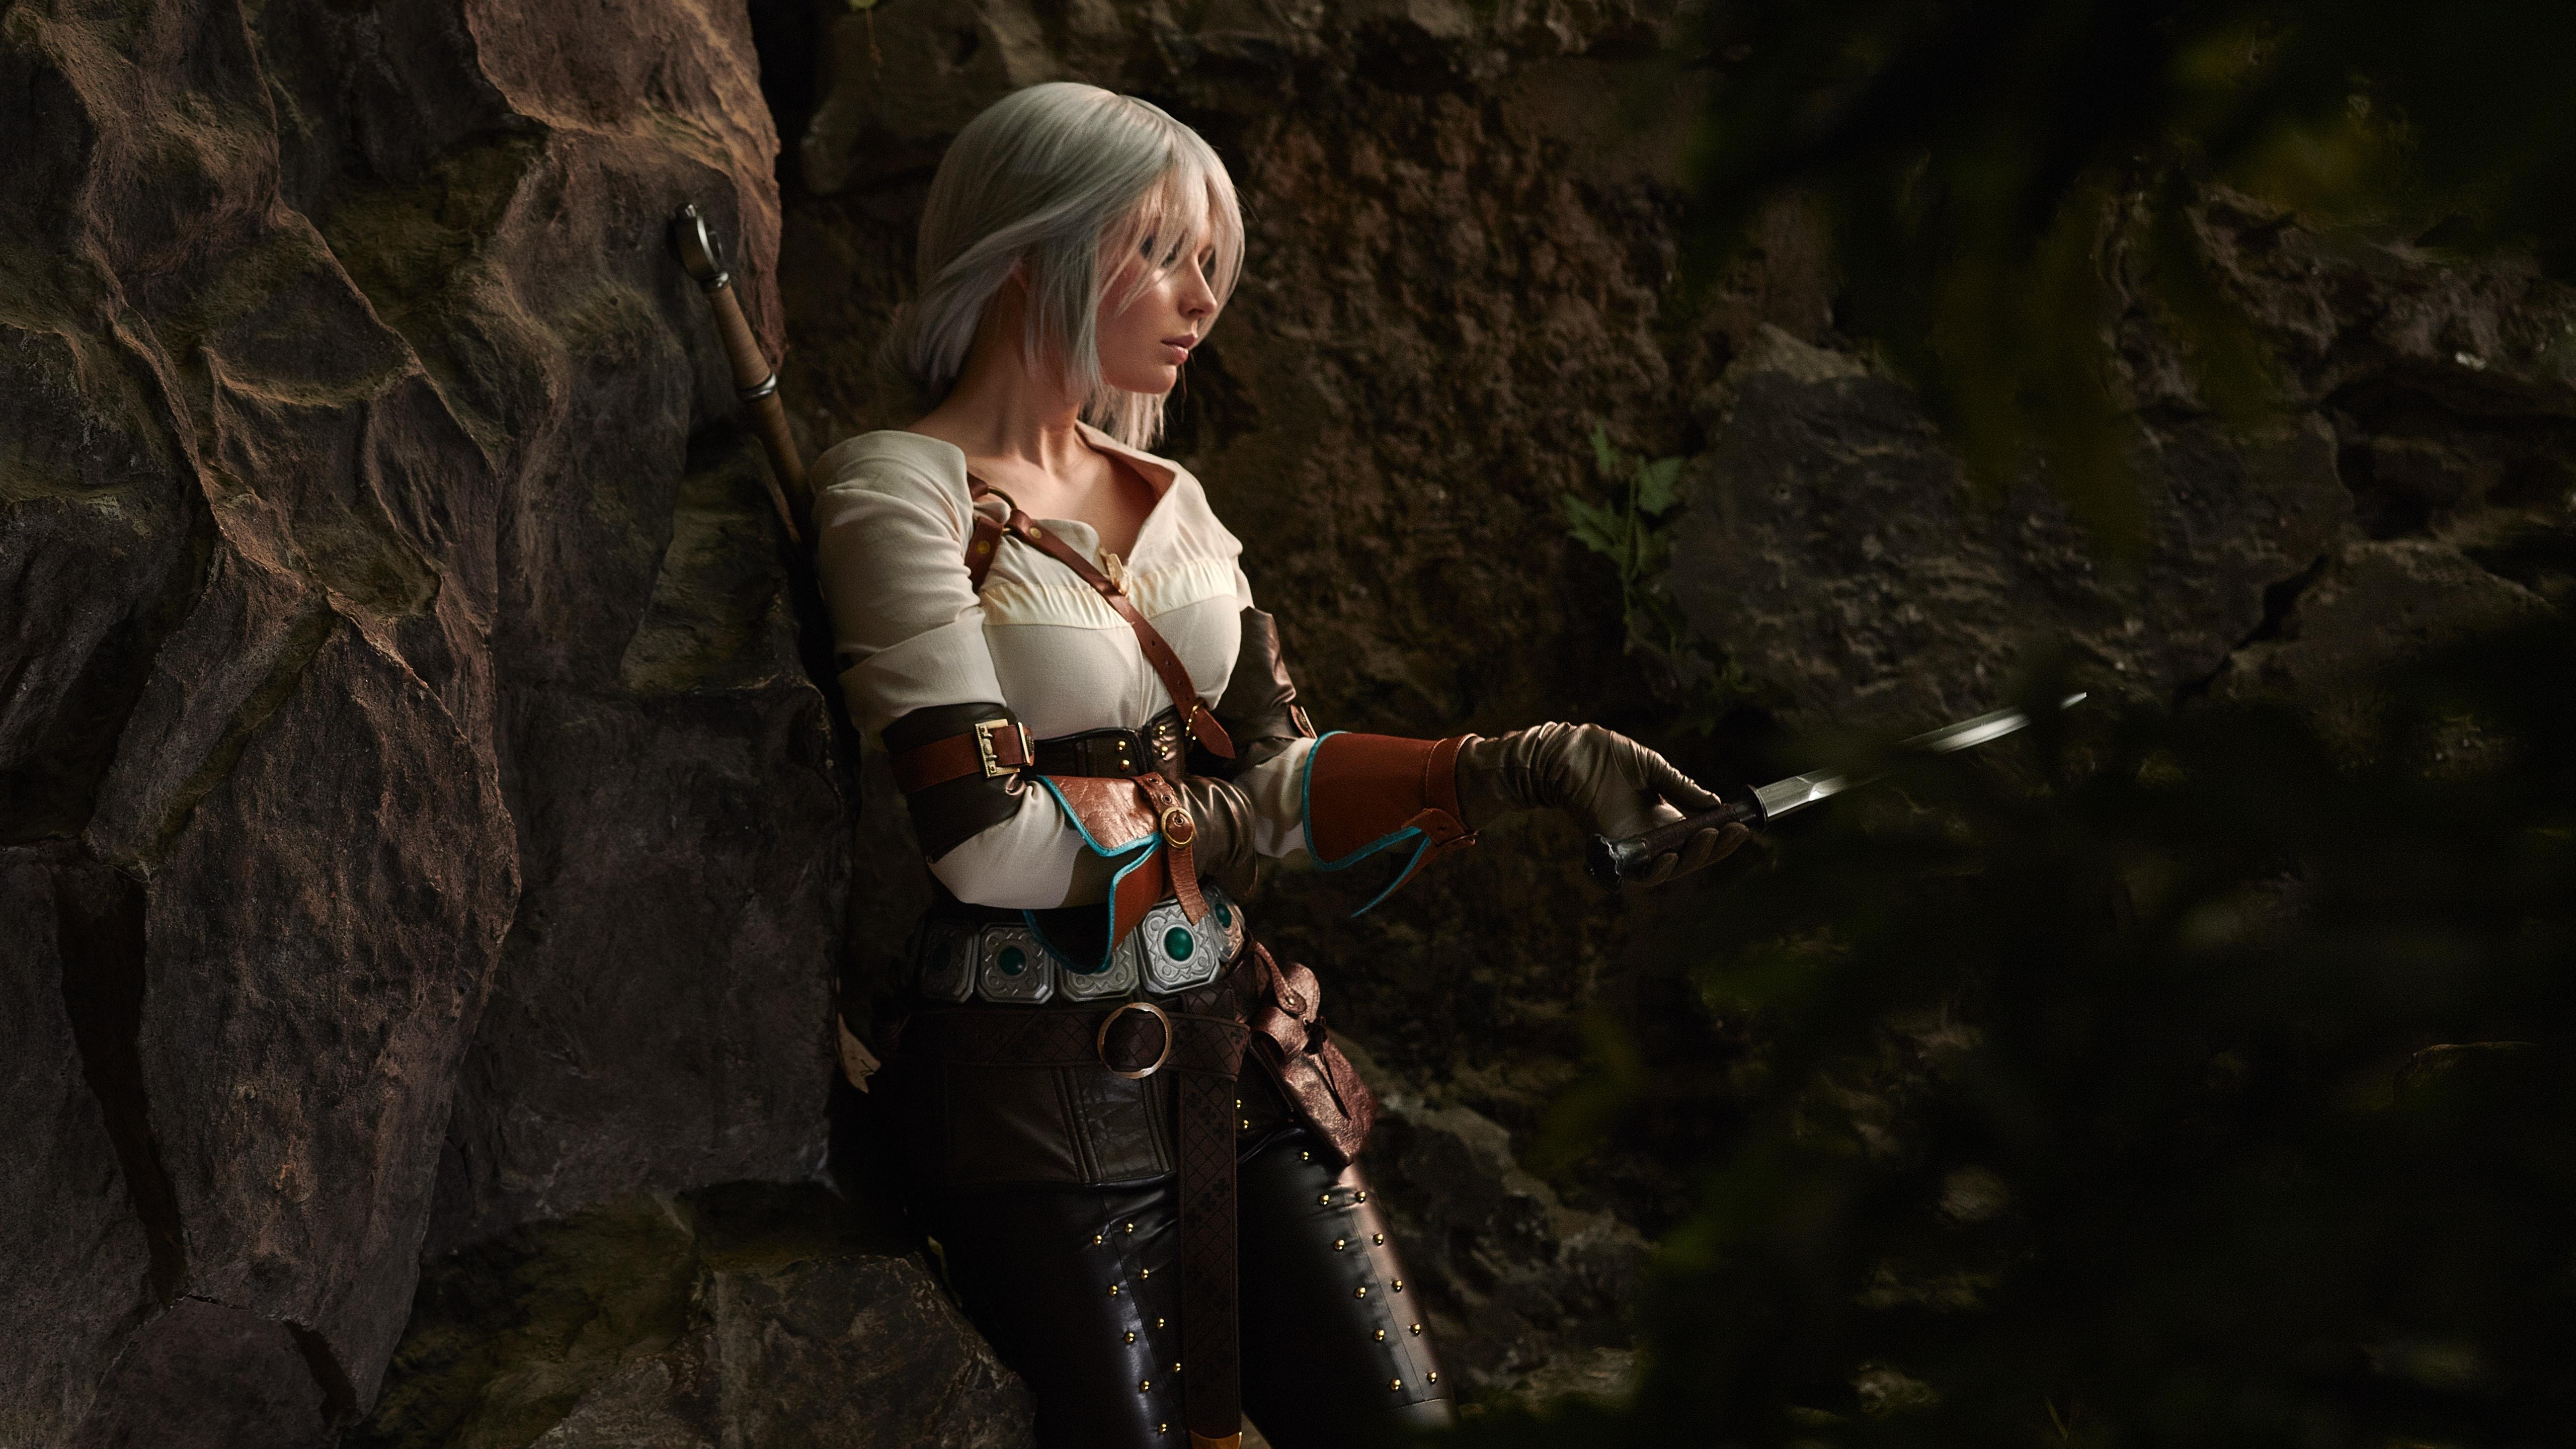 Wallpaper Cosplay Girl Sword The Witcher 3 Wild Hunt 5120x2880